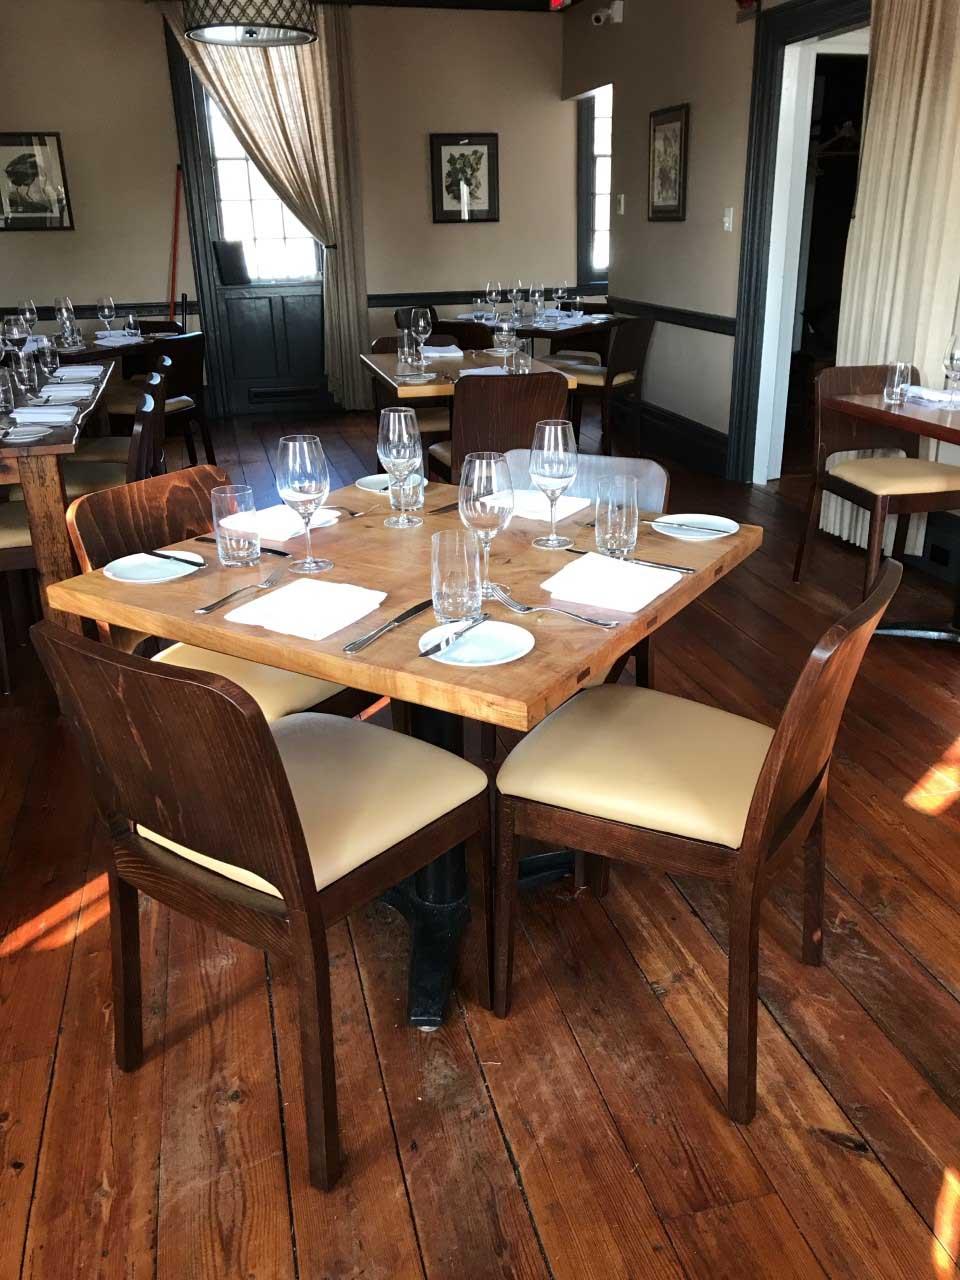 Brick Farm Tavern - HopewellNew Jersey